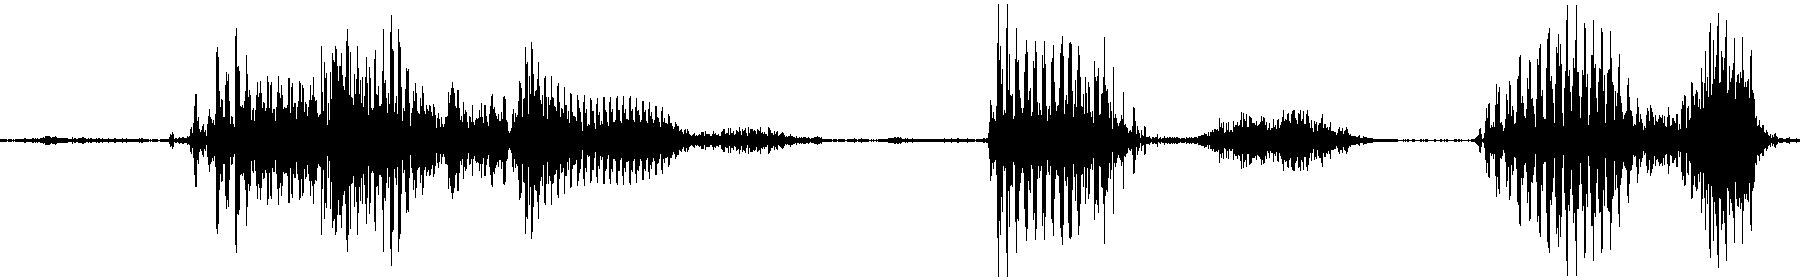 emotion thoughs music 130bpm